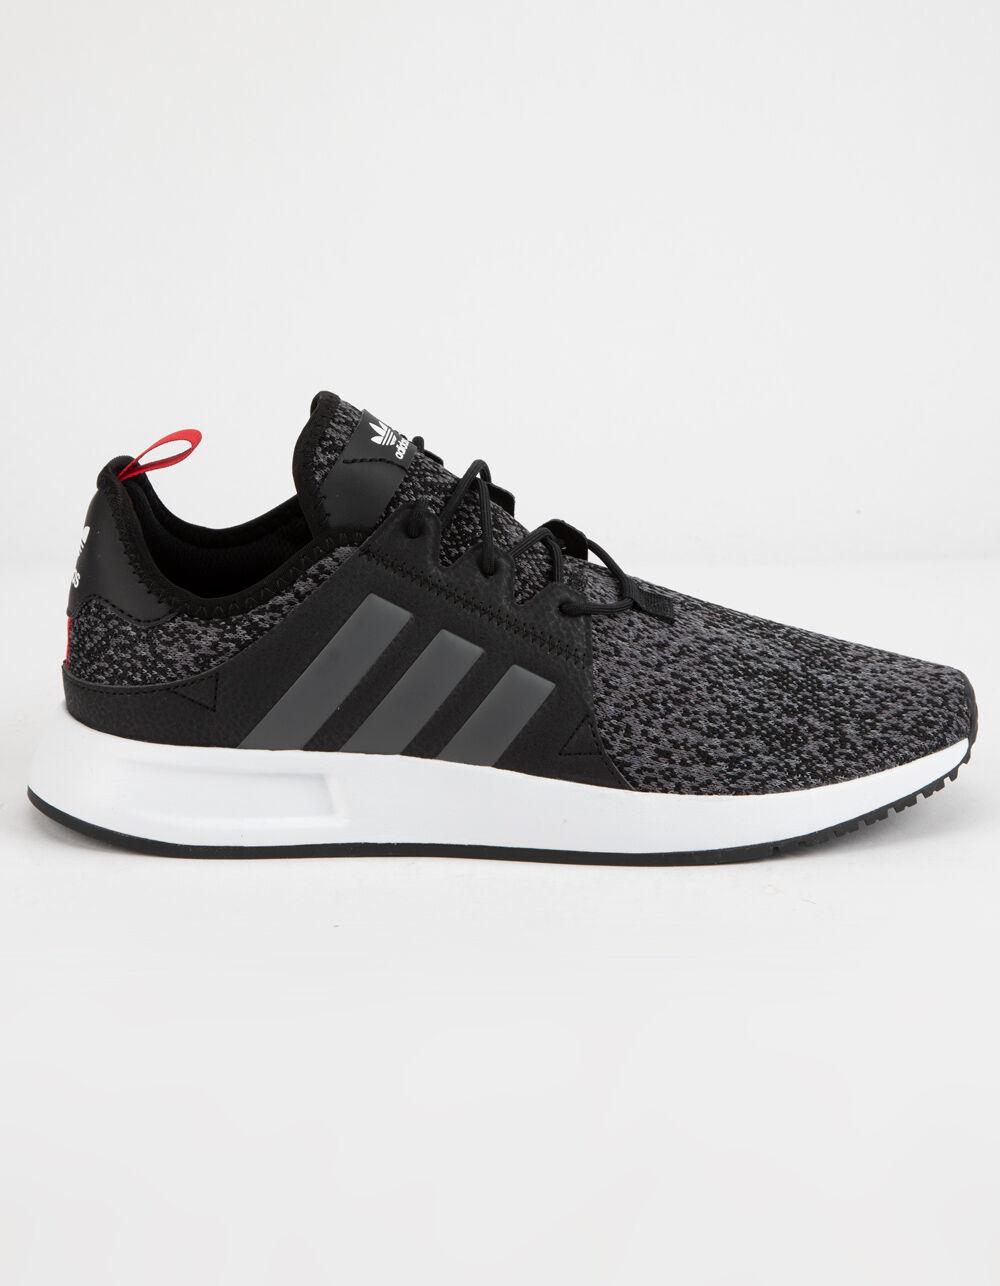 ADIDAS X_PLR Core Black & Gray Shoes